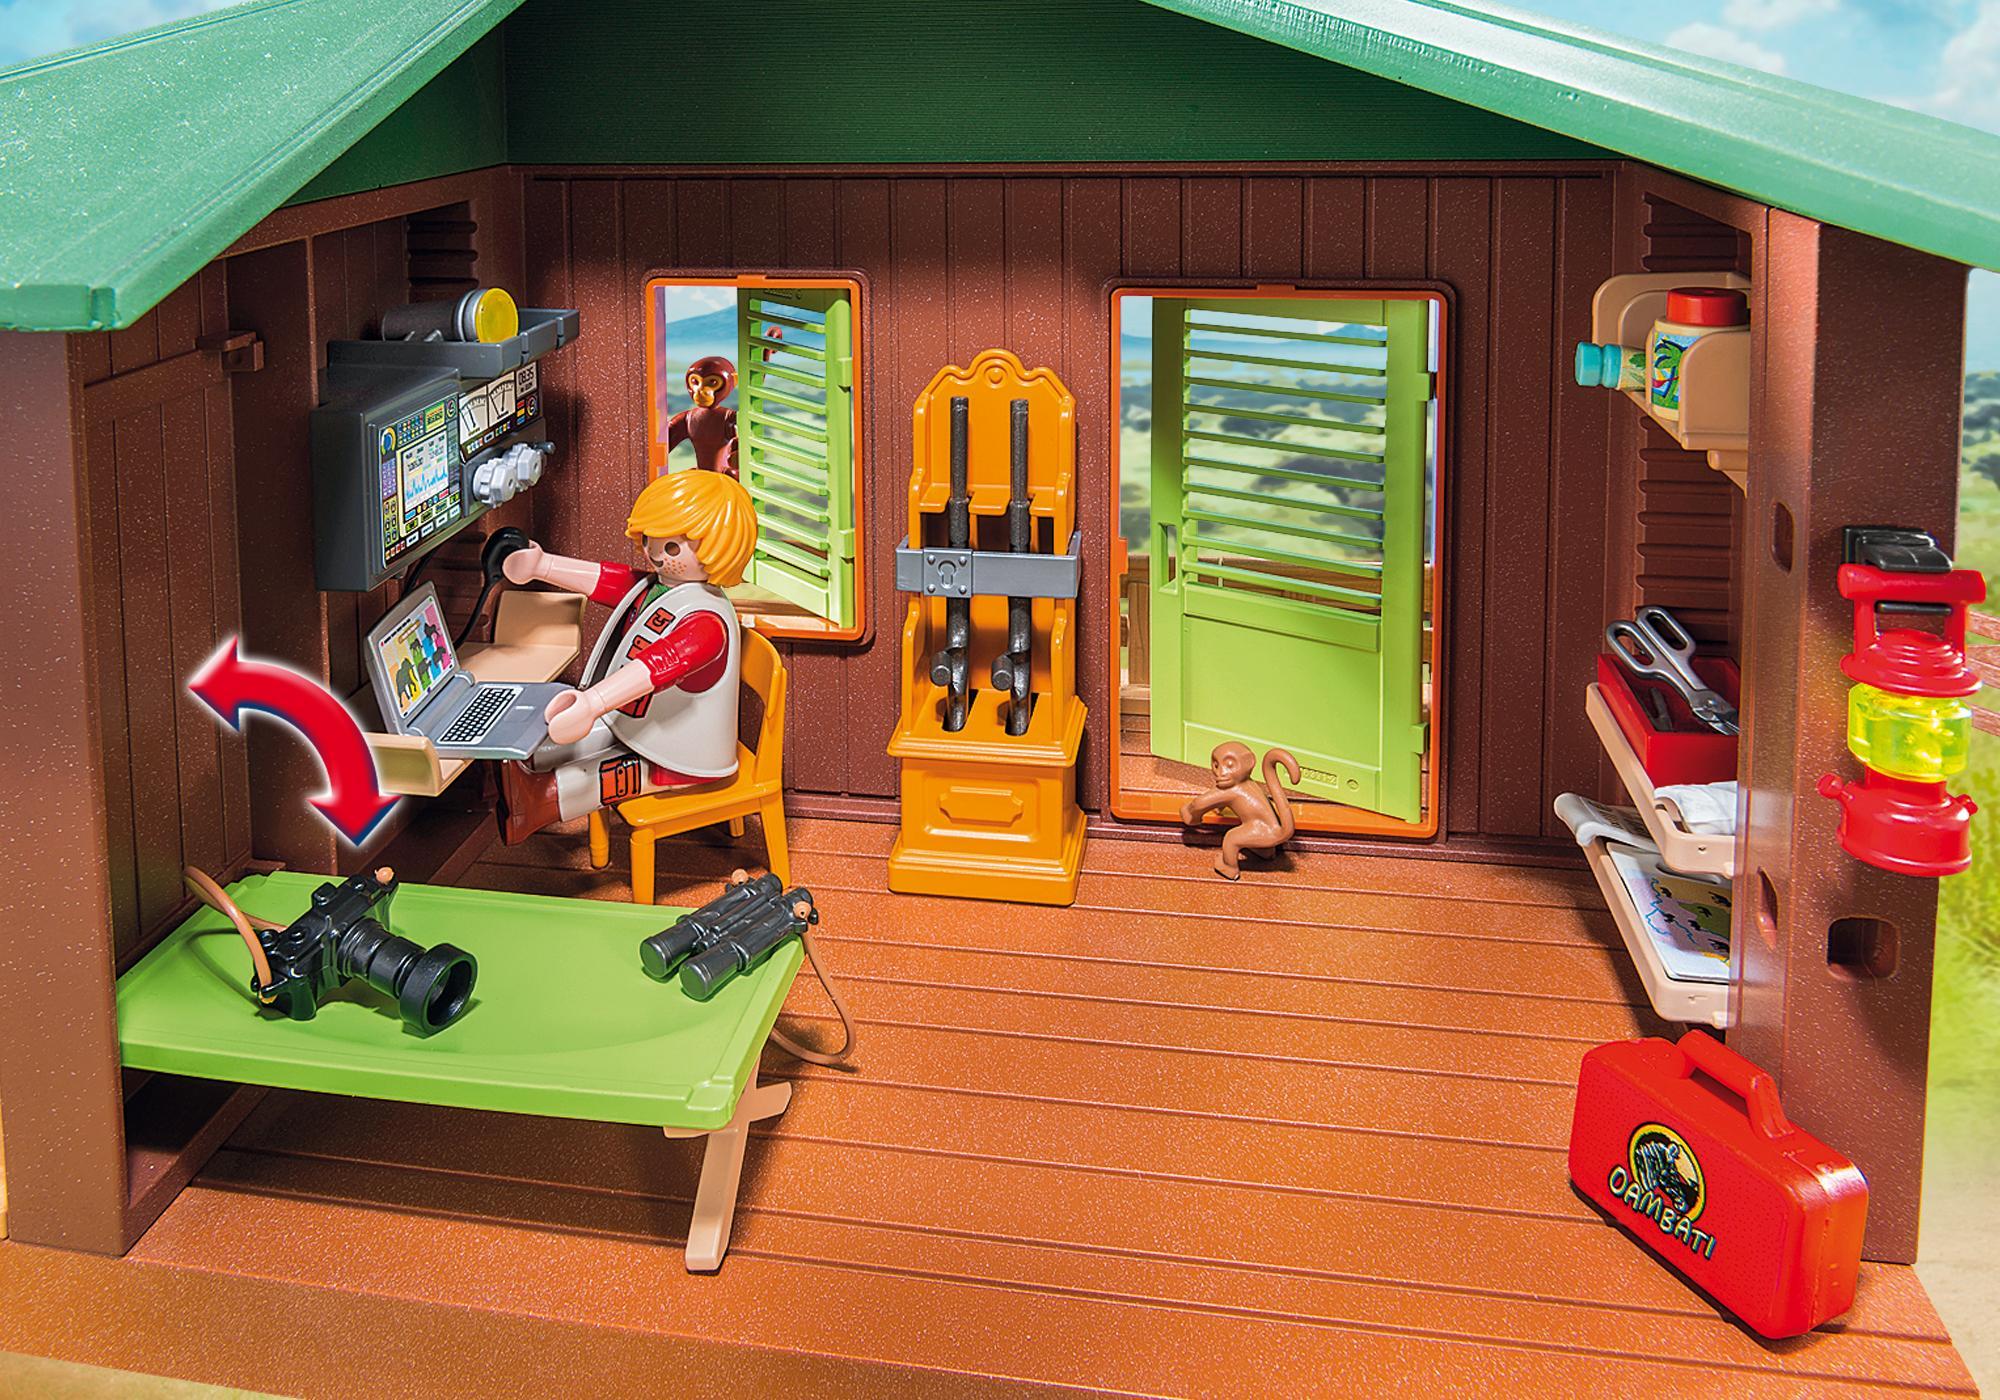 http://media.playmobil.com/i/playmobil/6936_product_extra2/Σταθμός περίθαλψης άγριων ζώων